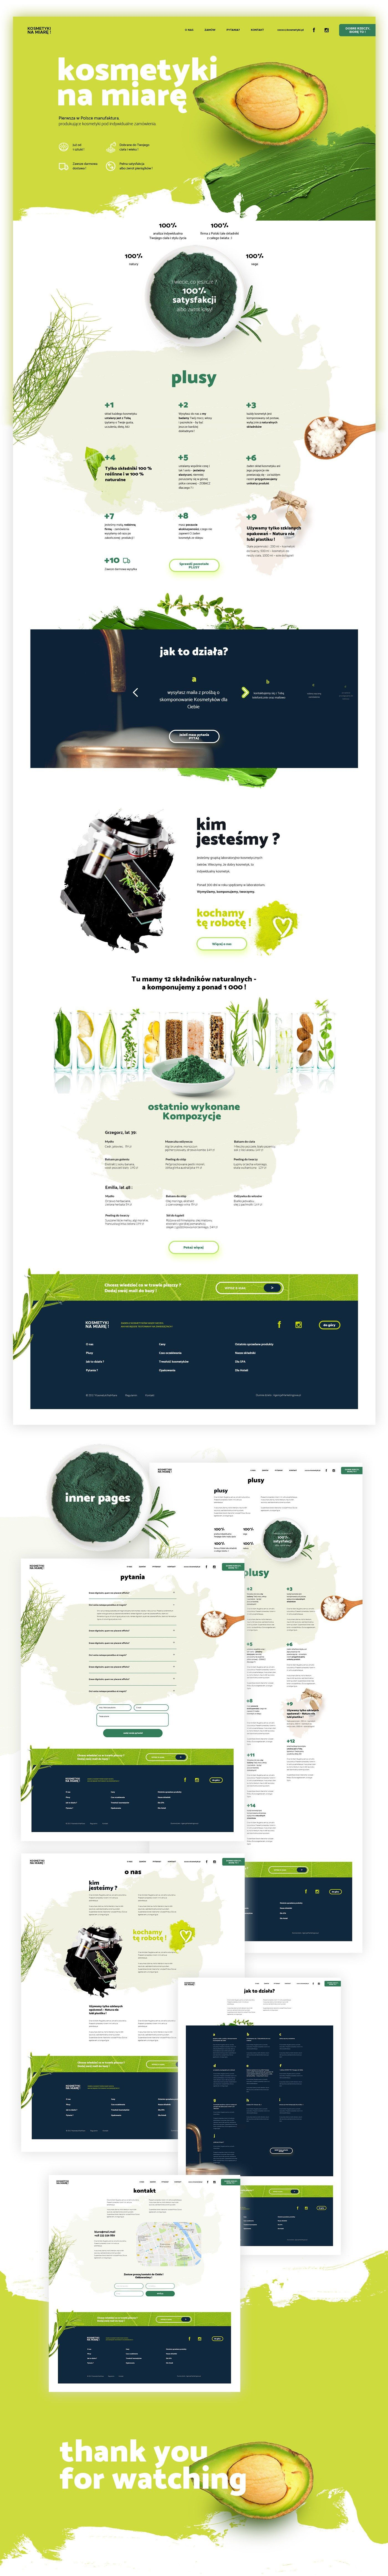 Natural cosmetics manufacture website | websites | Pinterest ...